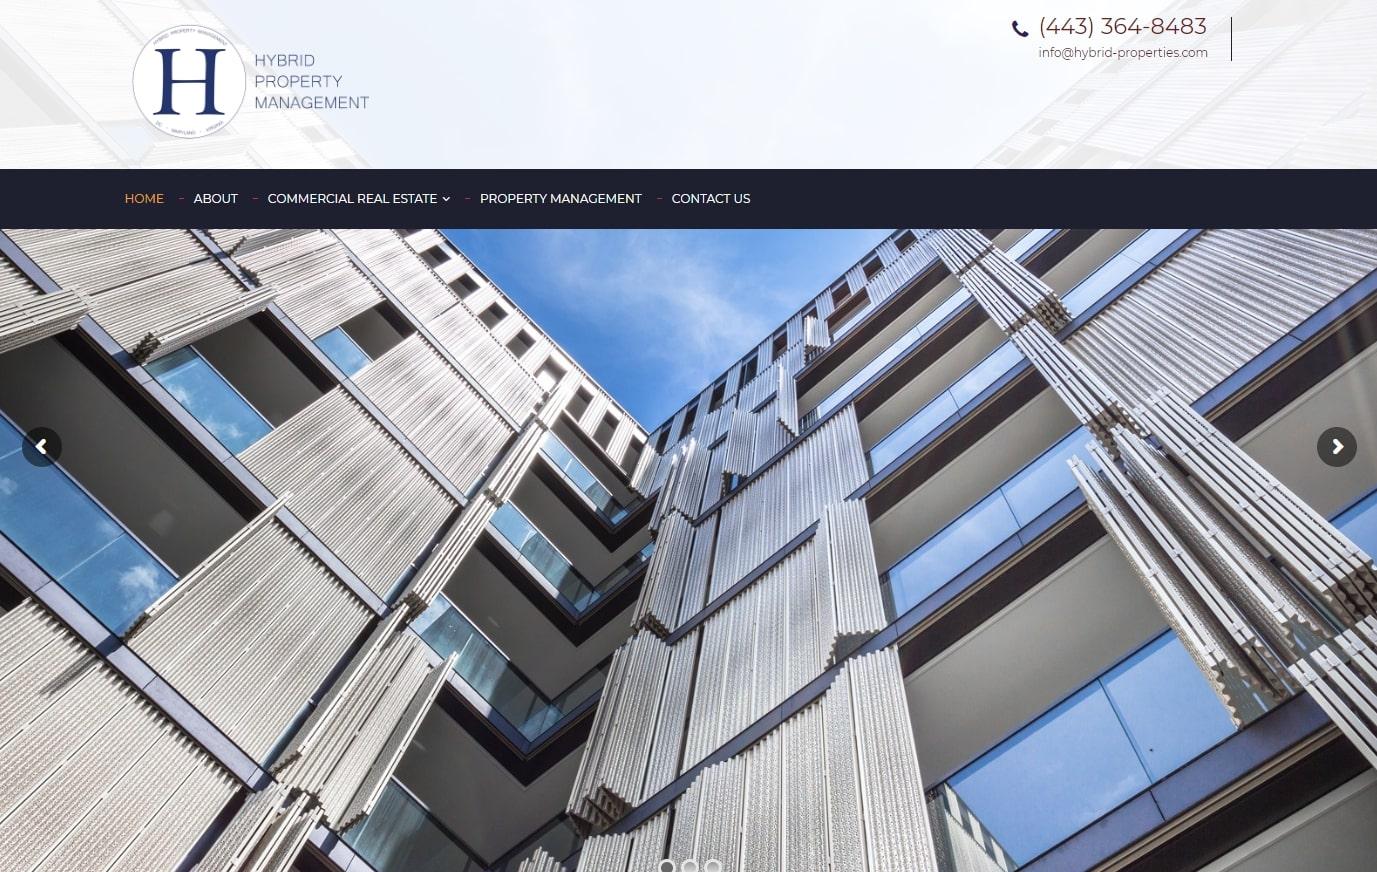 hybrid property management